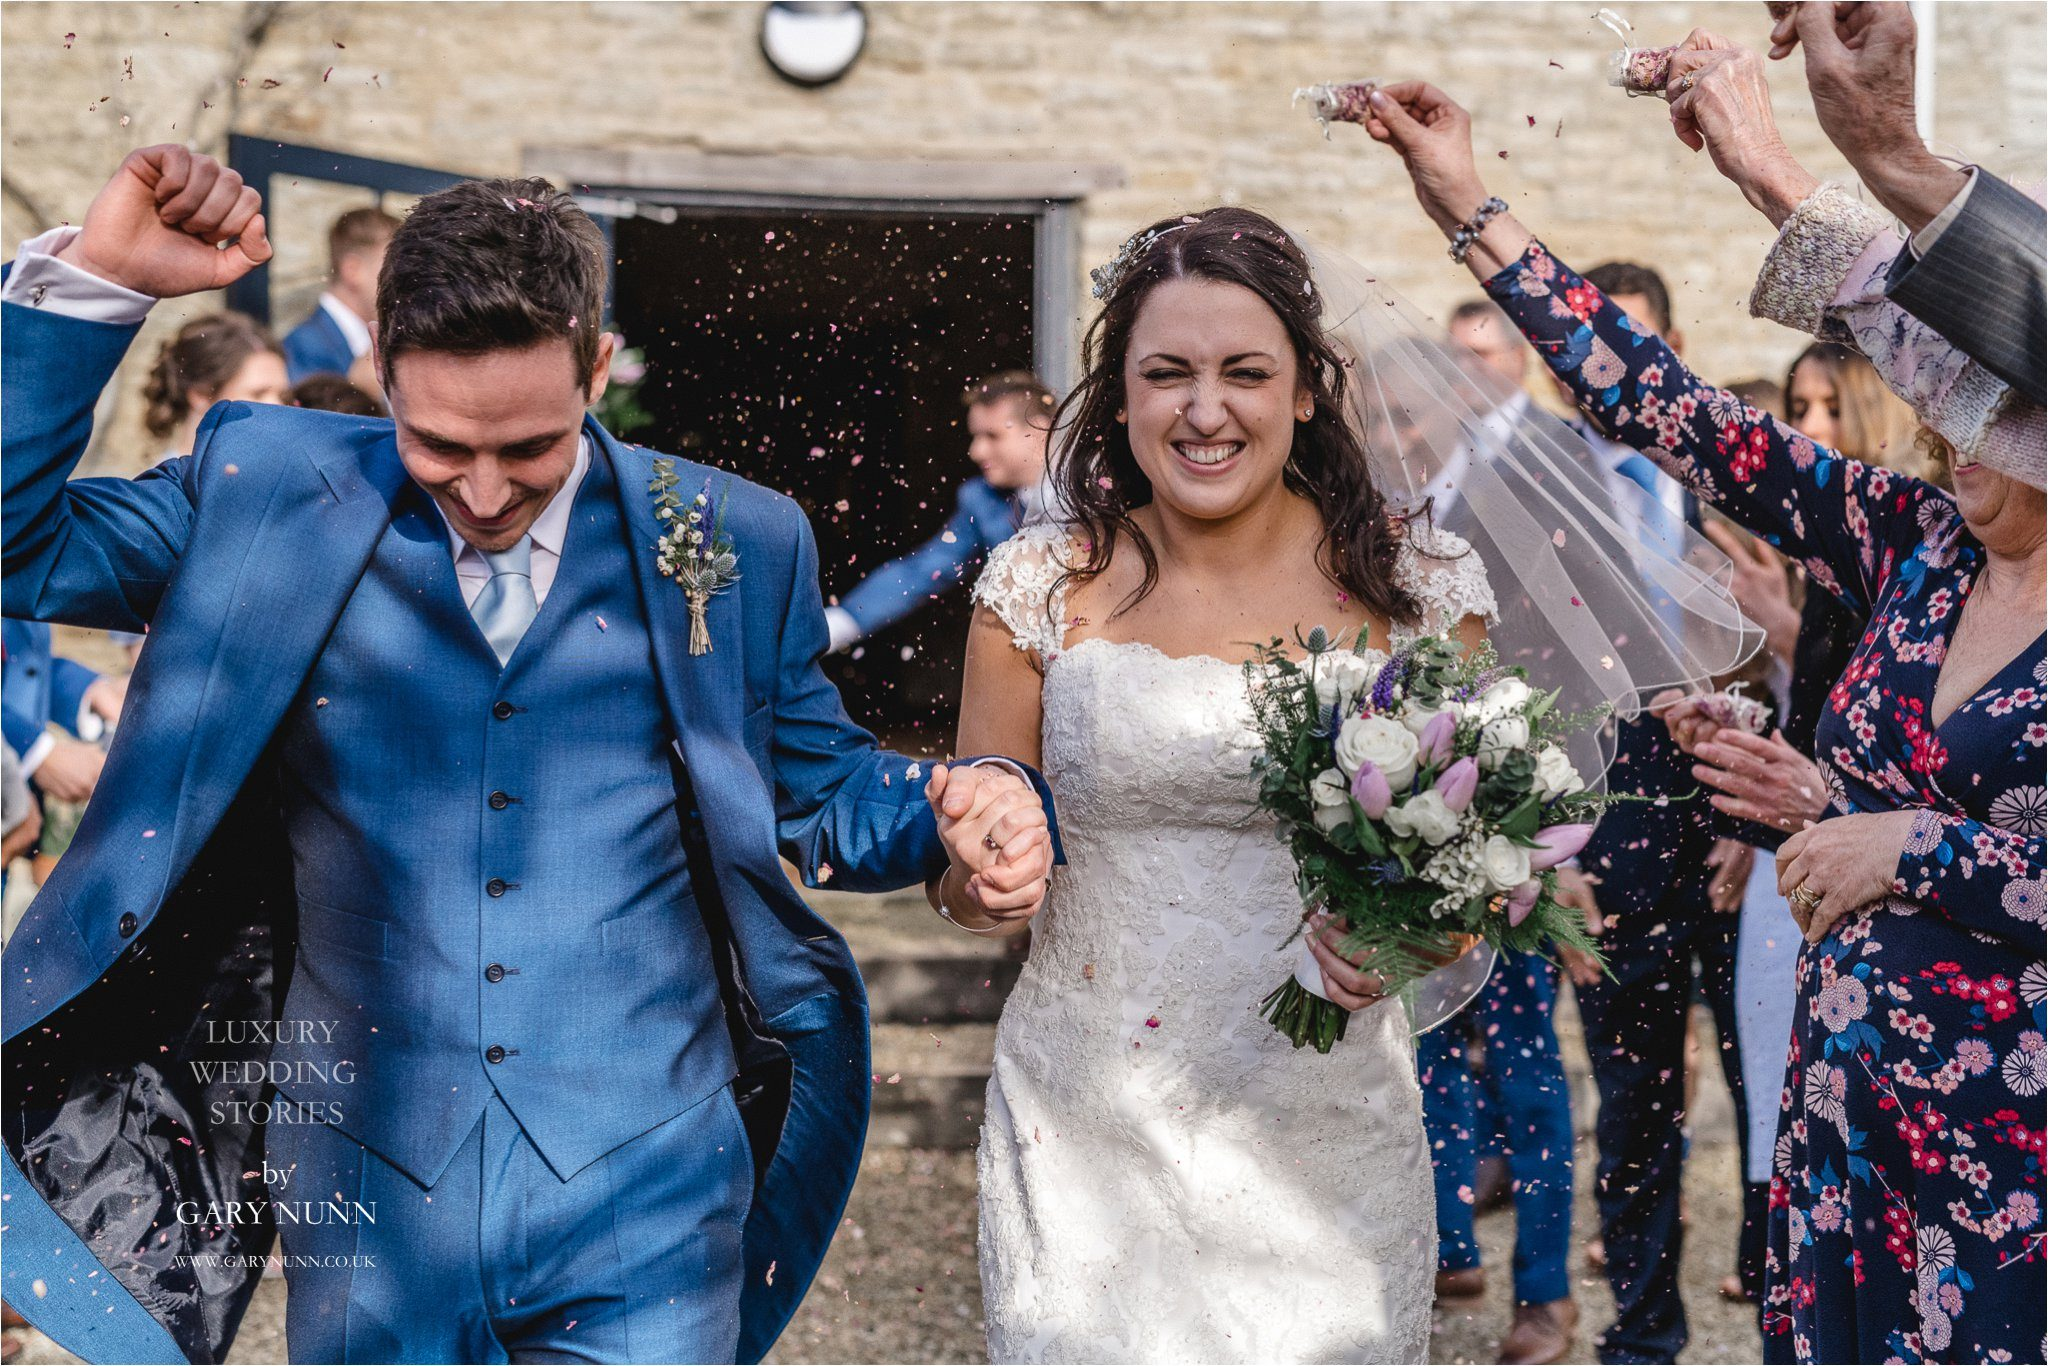 merriscourt, Gloucester wedding photographer, confetti shot